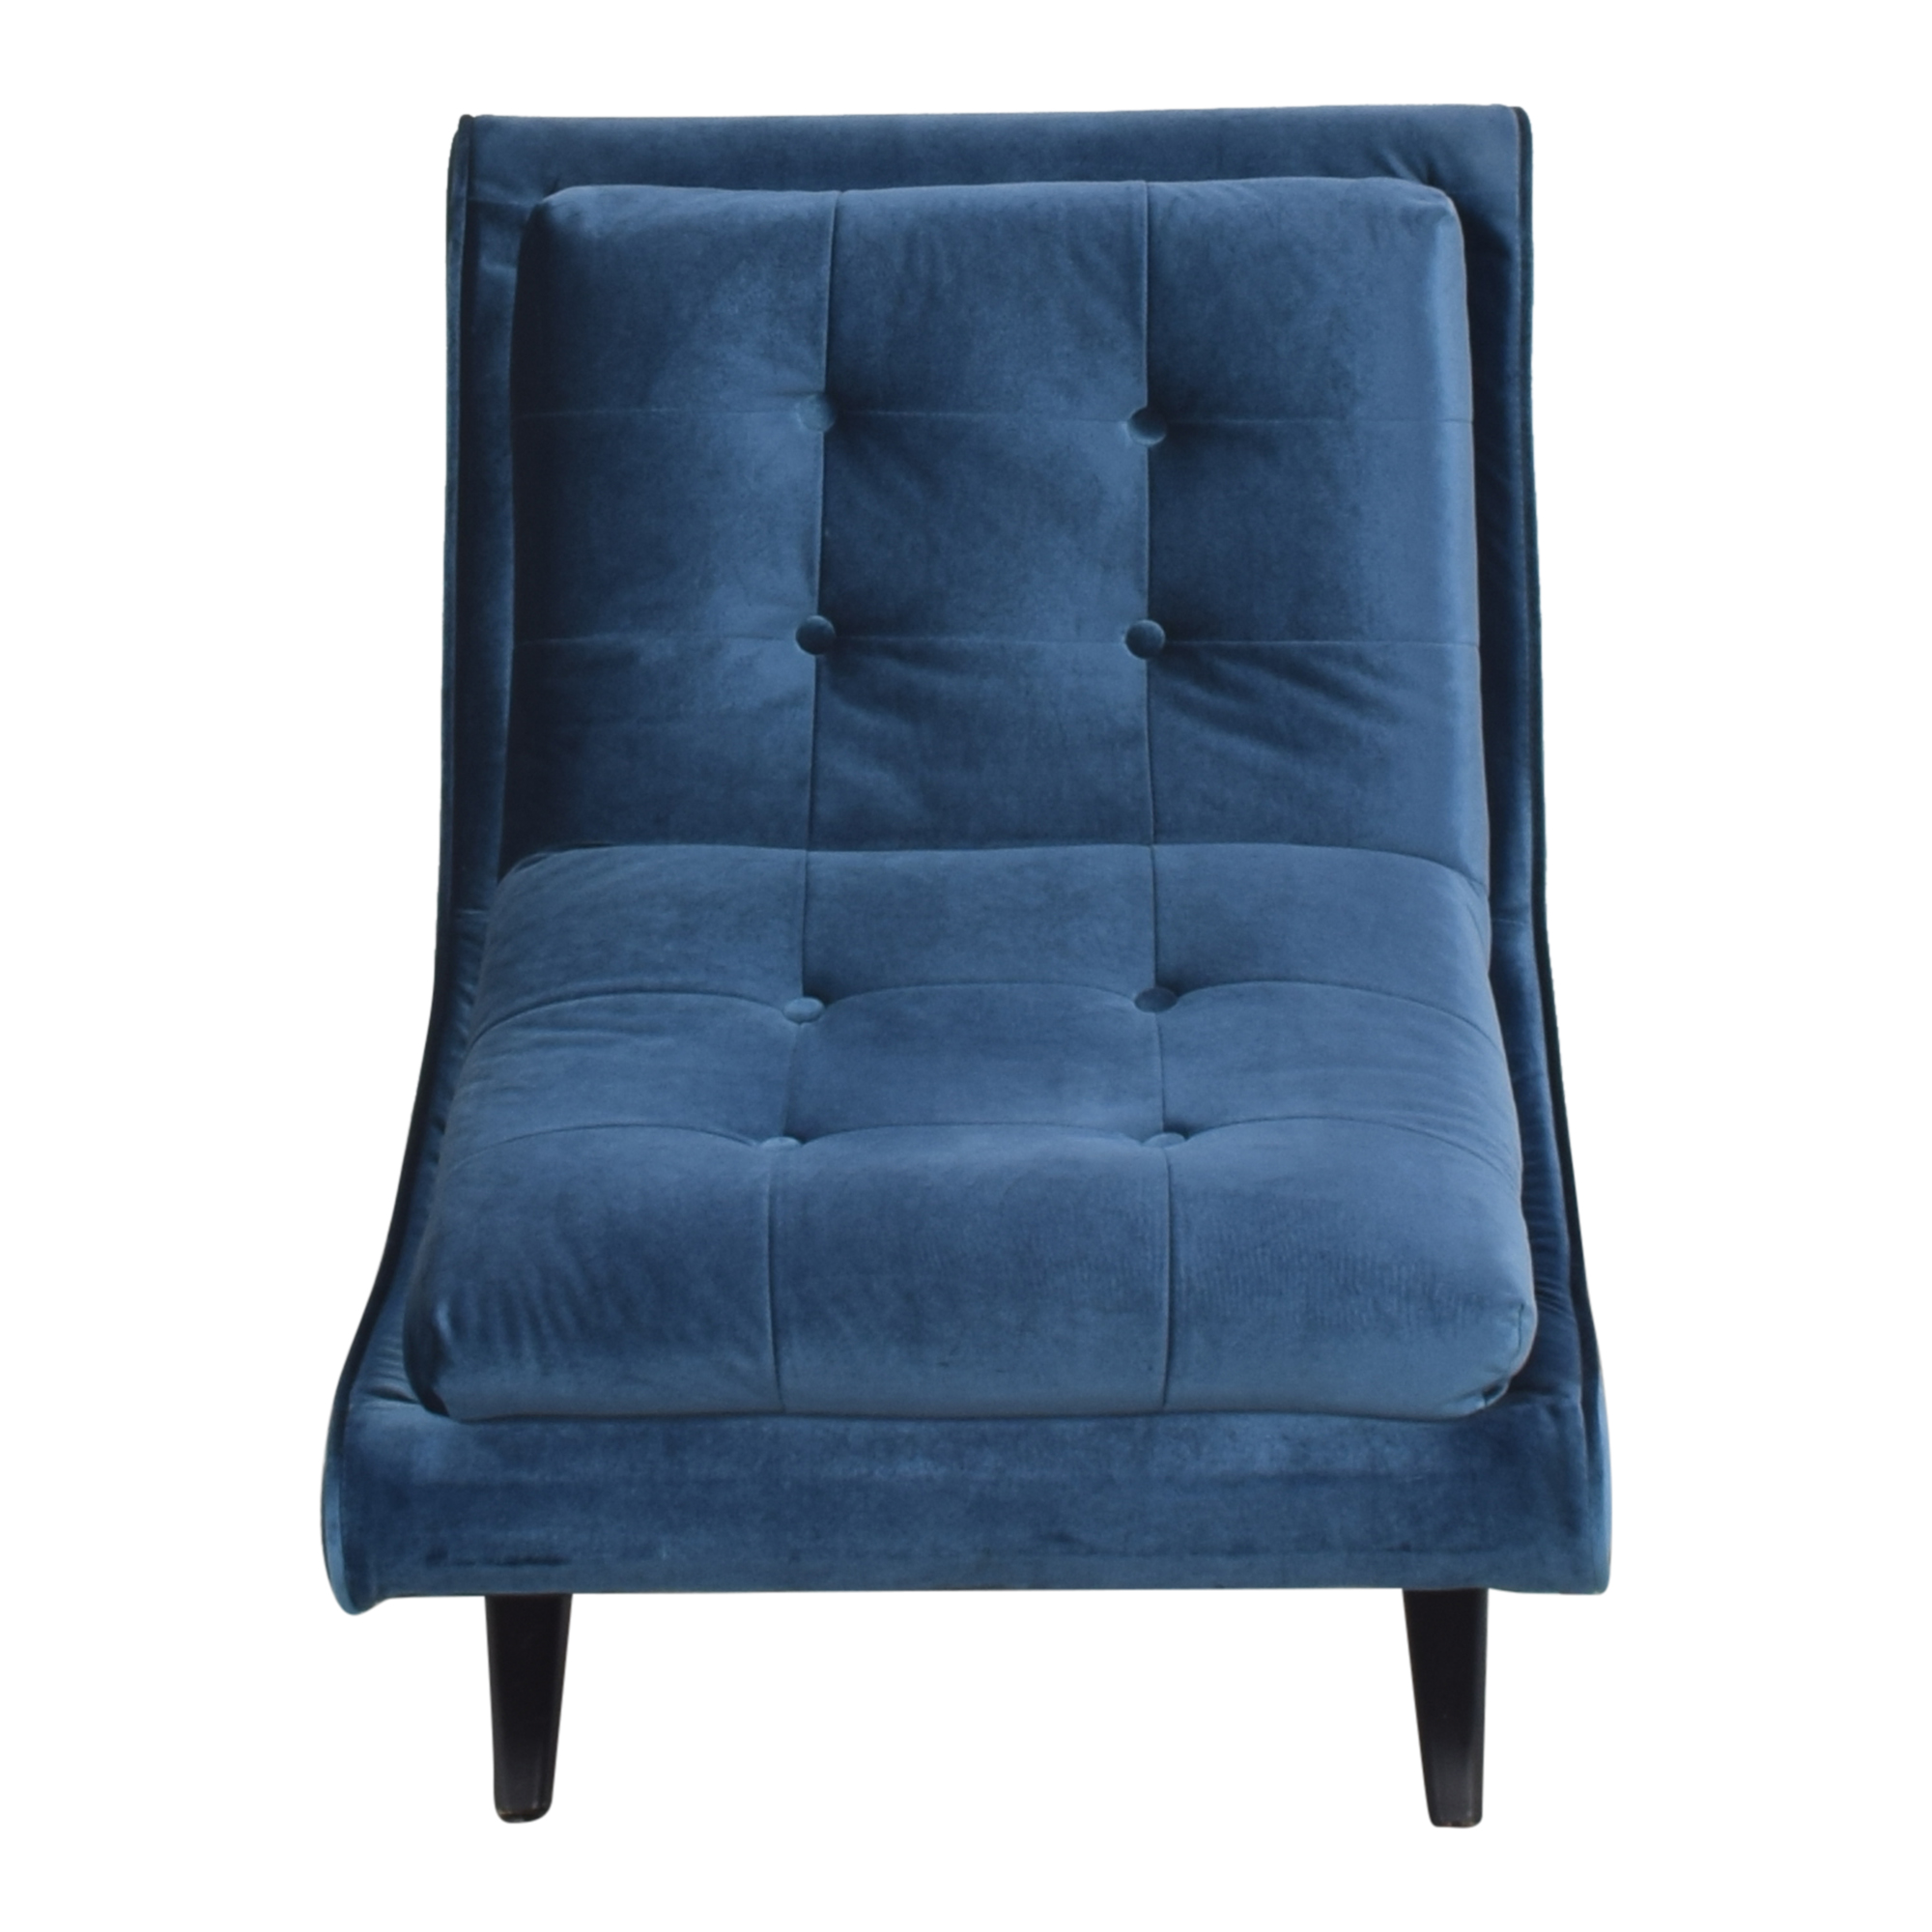 Armen Living Armen Living 5th Avenue Armless Swayback Lounge Chair blue